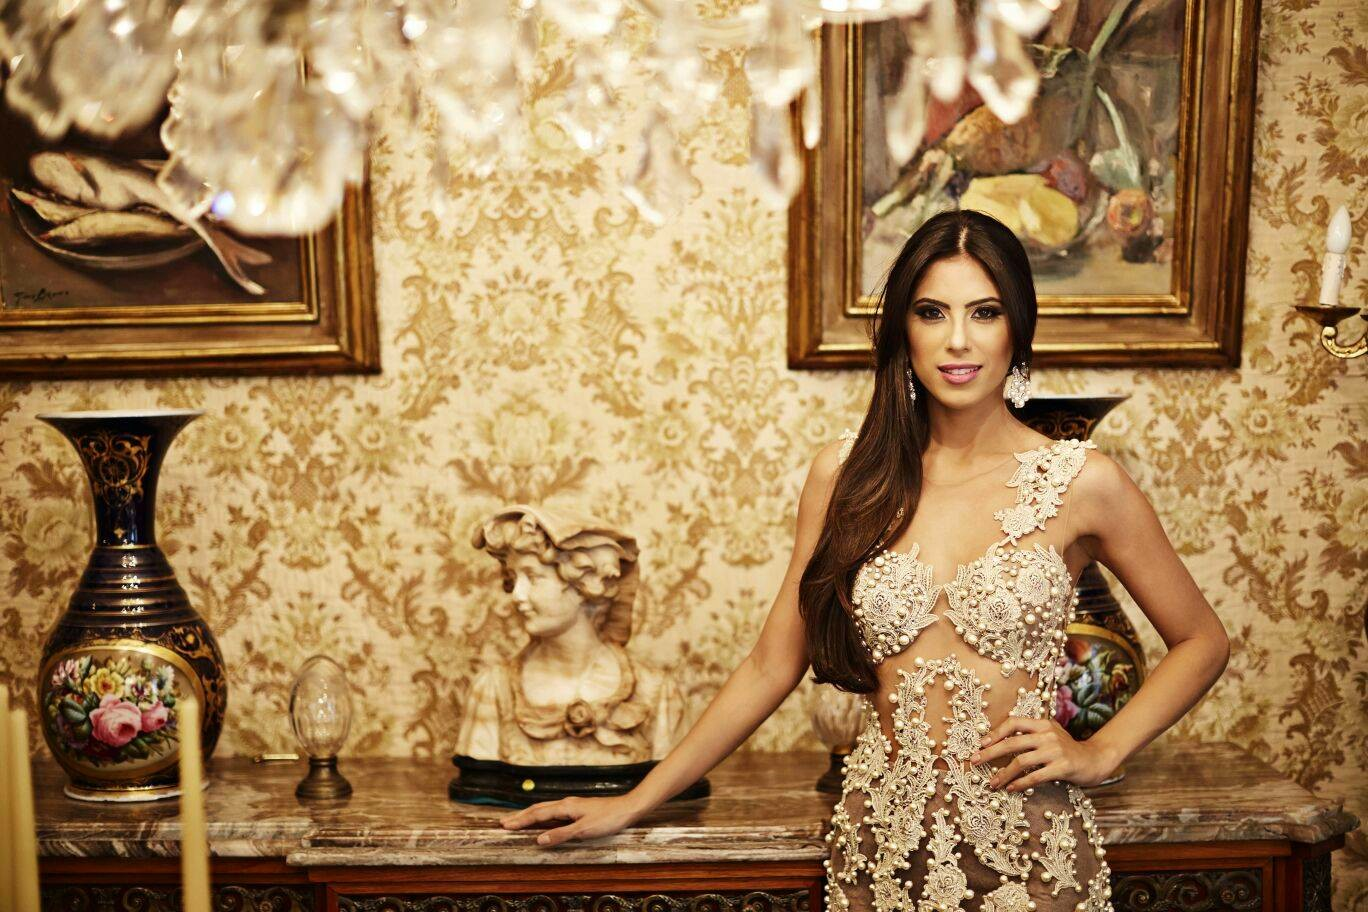 deise benicio, miss supranational brazil 2020/top 10 de miss international 2014. - Página 3 8obdm4ll